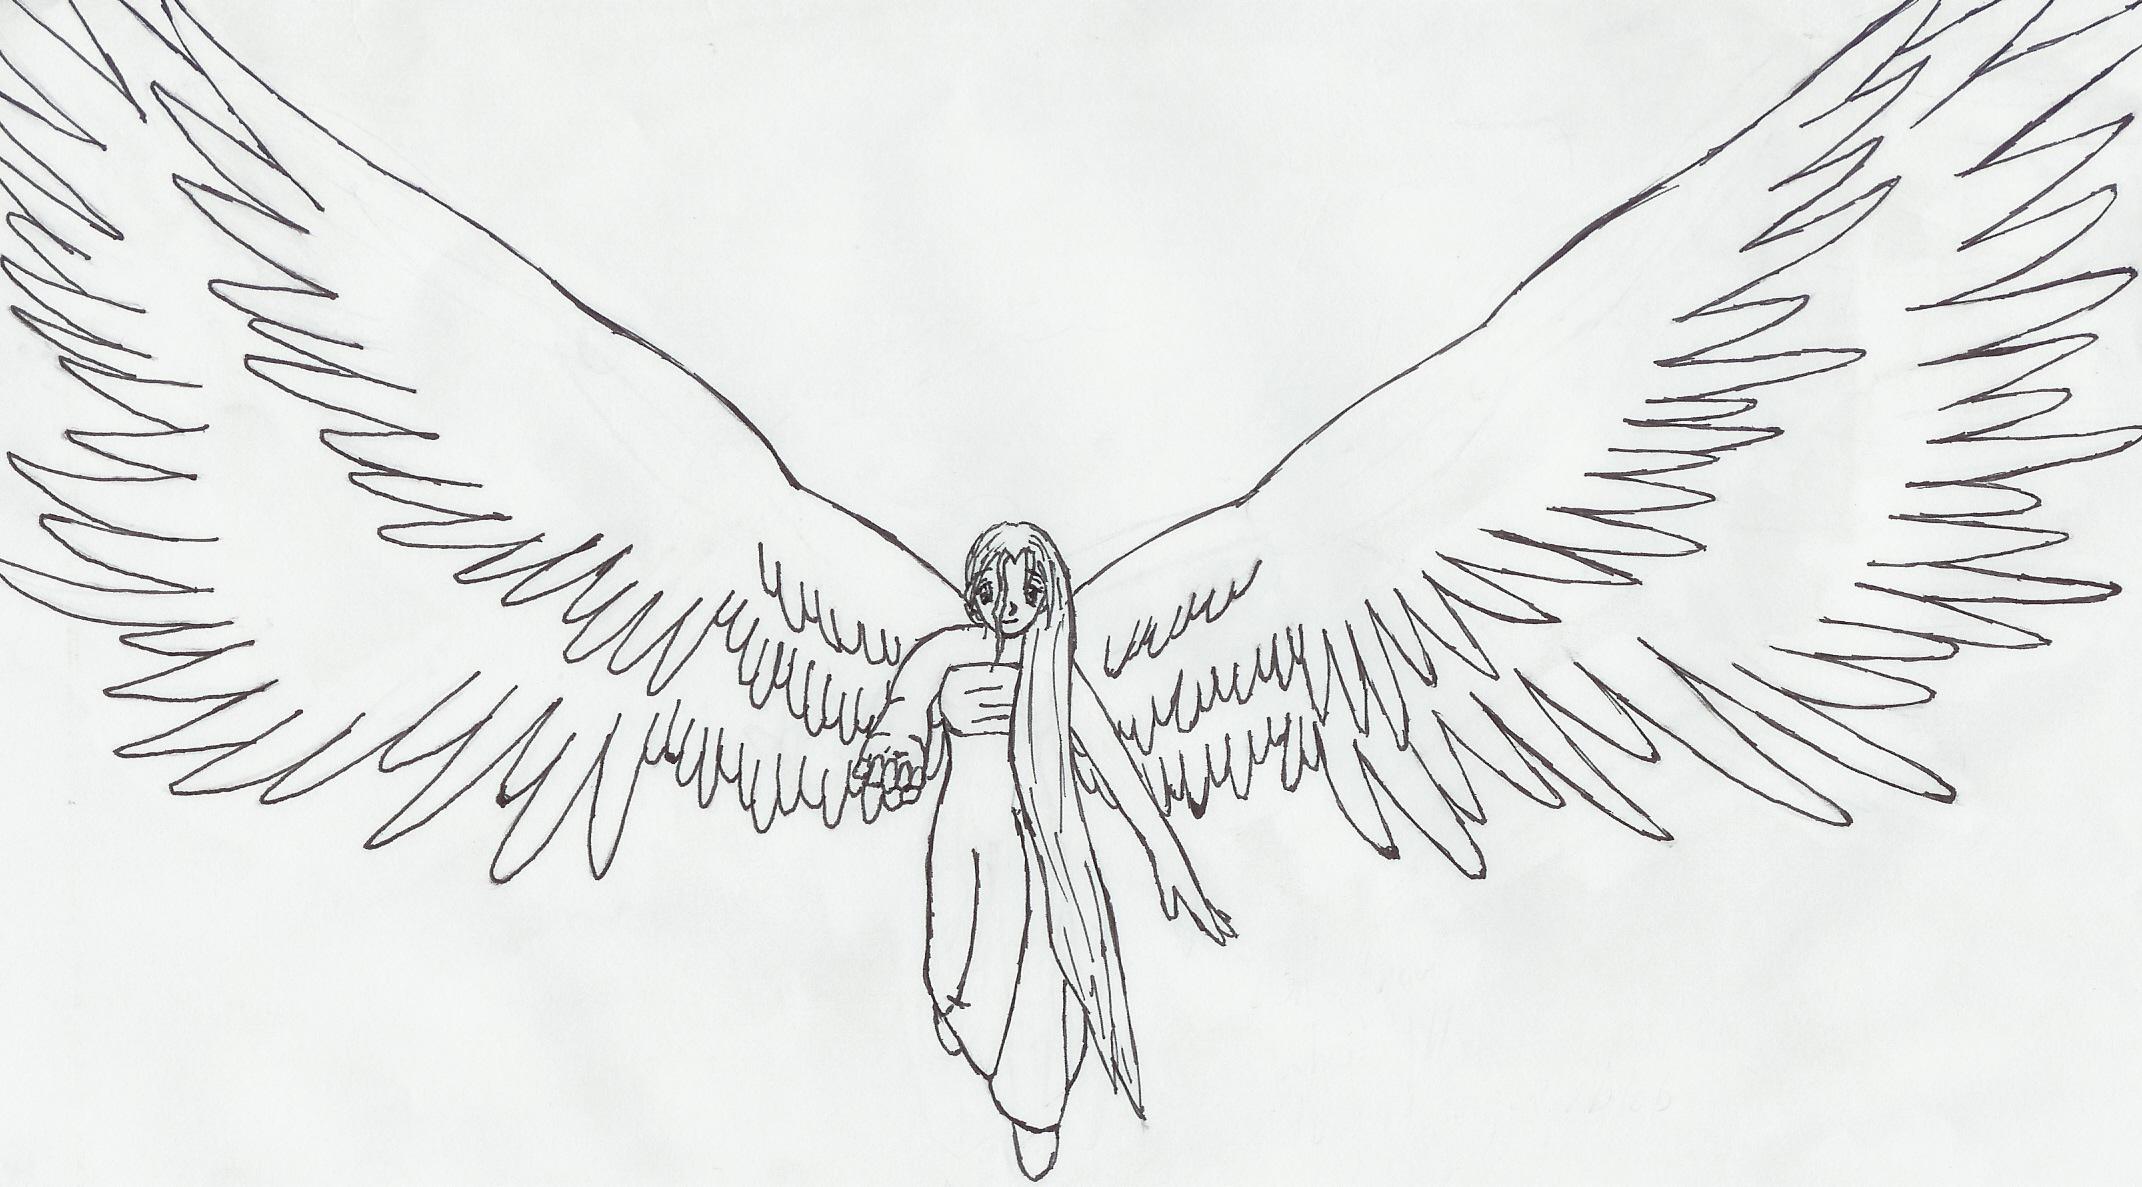 Drawn angel big wing By Big potatorush18 on DeviantArt